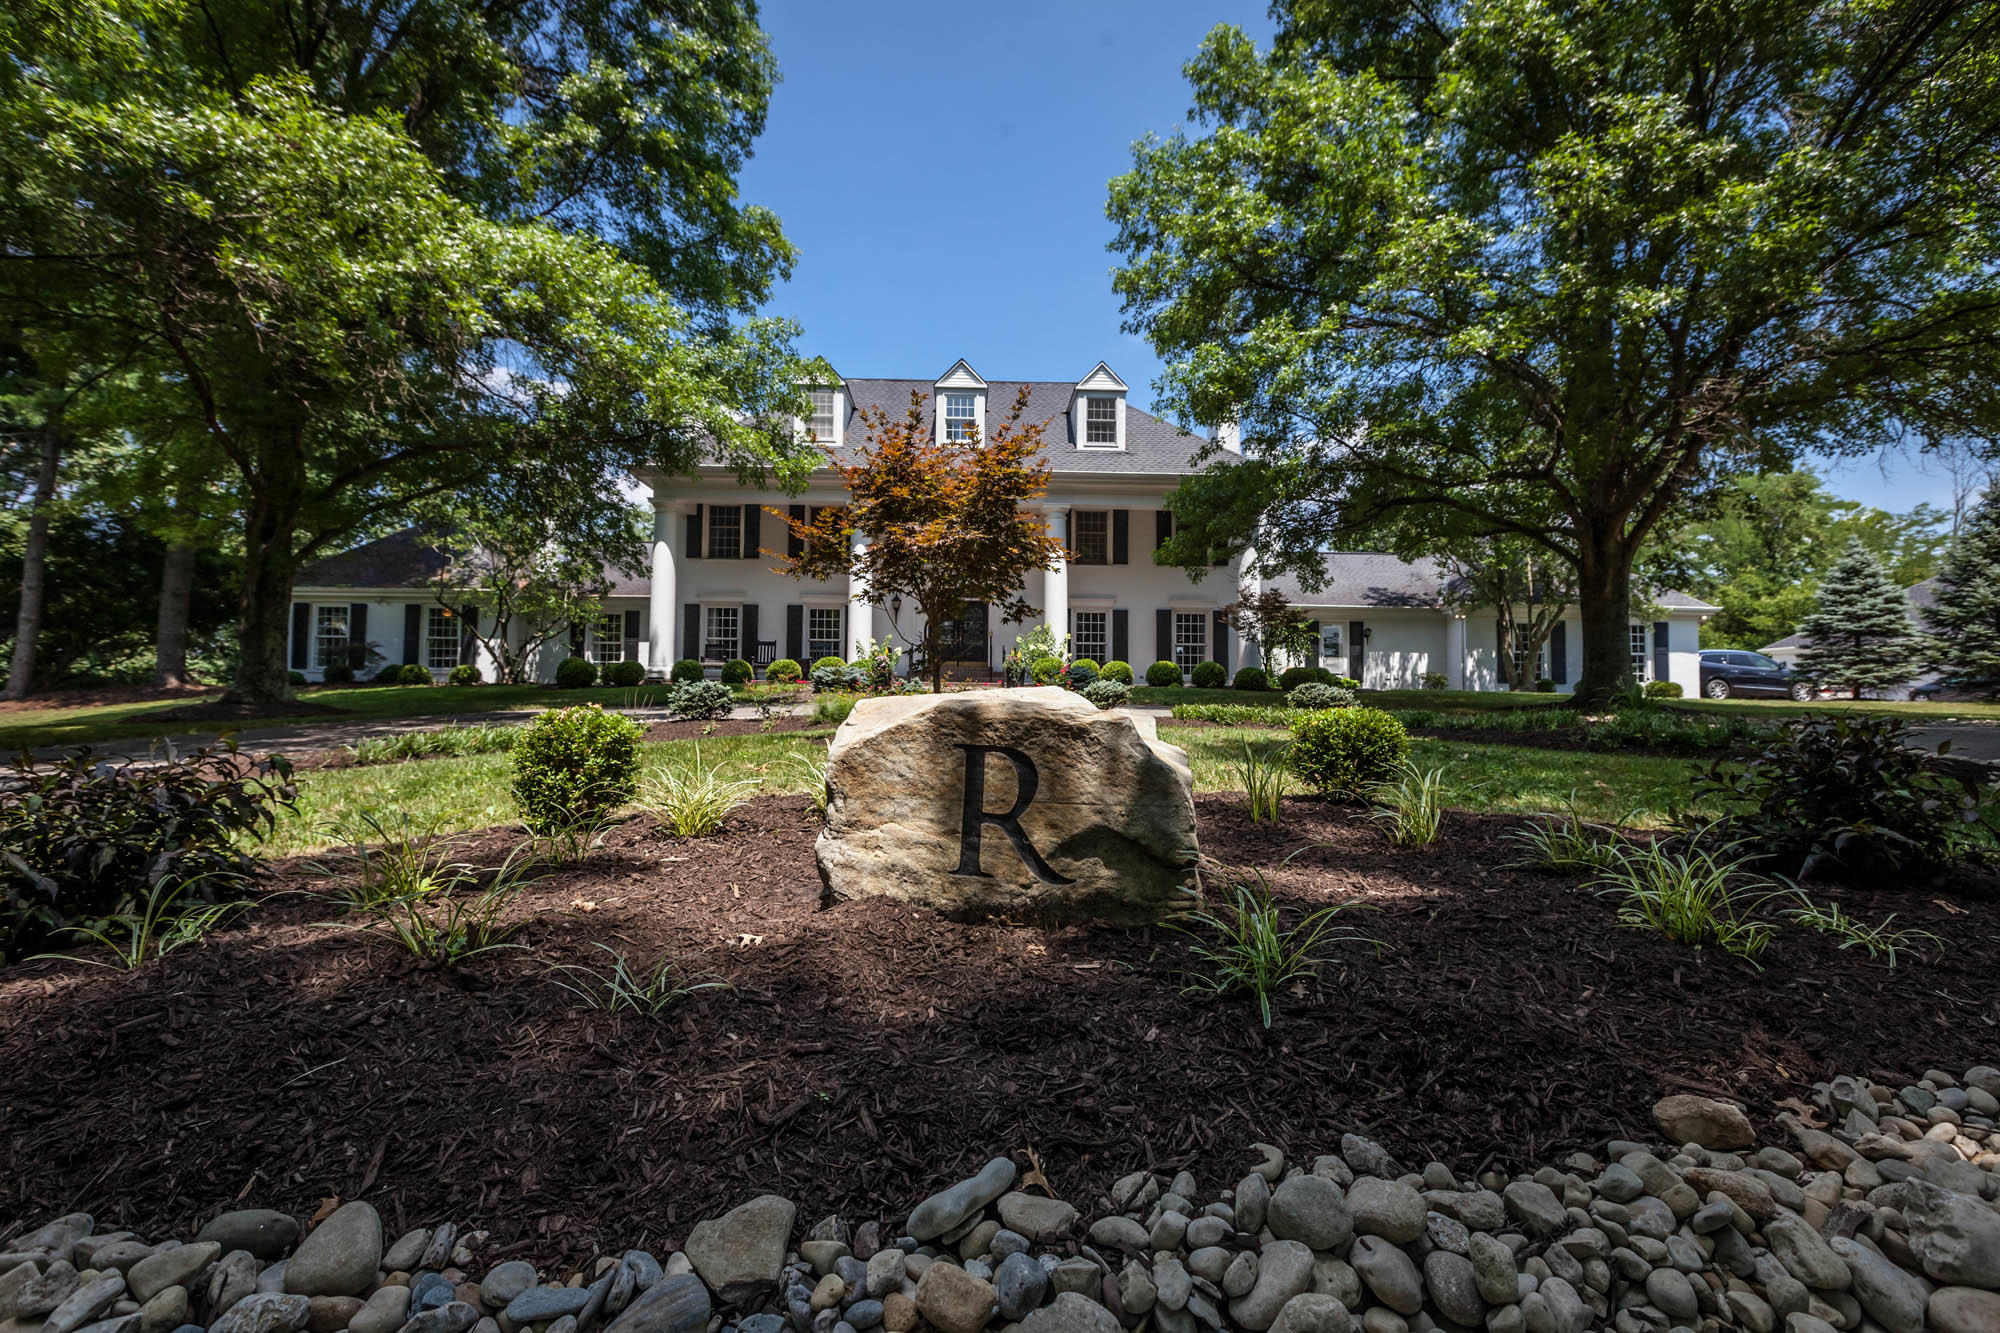 The Ridge Ohio Residential Alcohol and Drug Treatment image 6